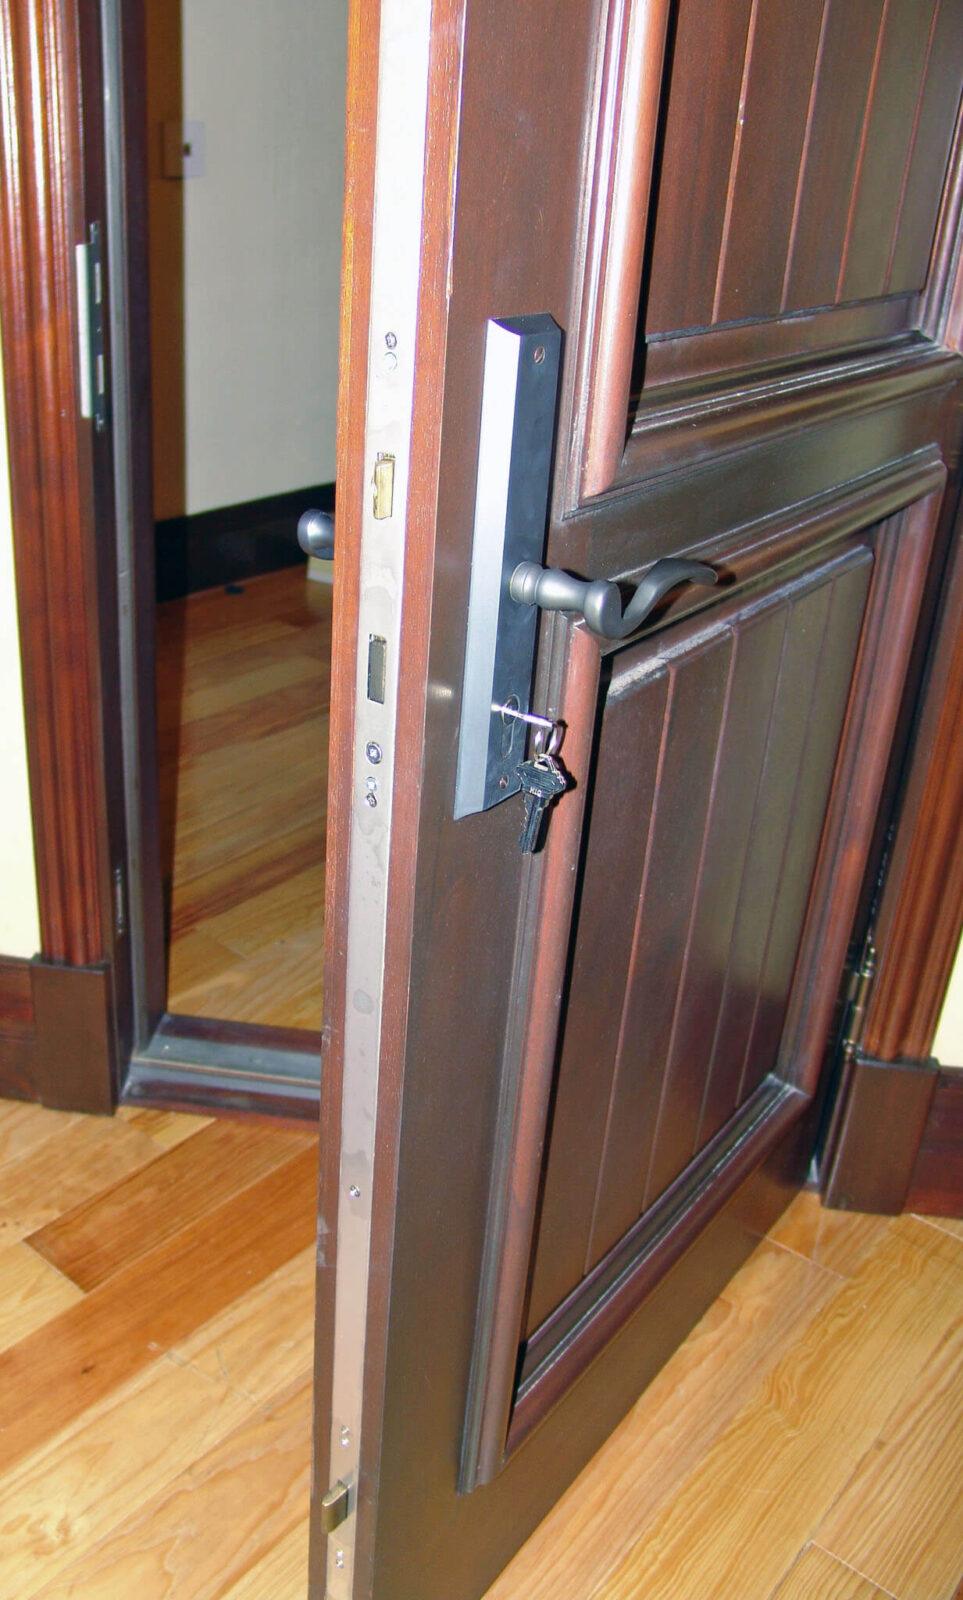 TROYA MAHOGANY FRONT DOOR DETAIL.